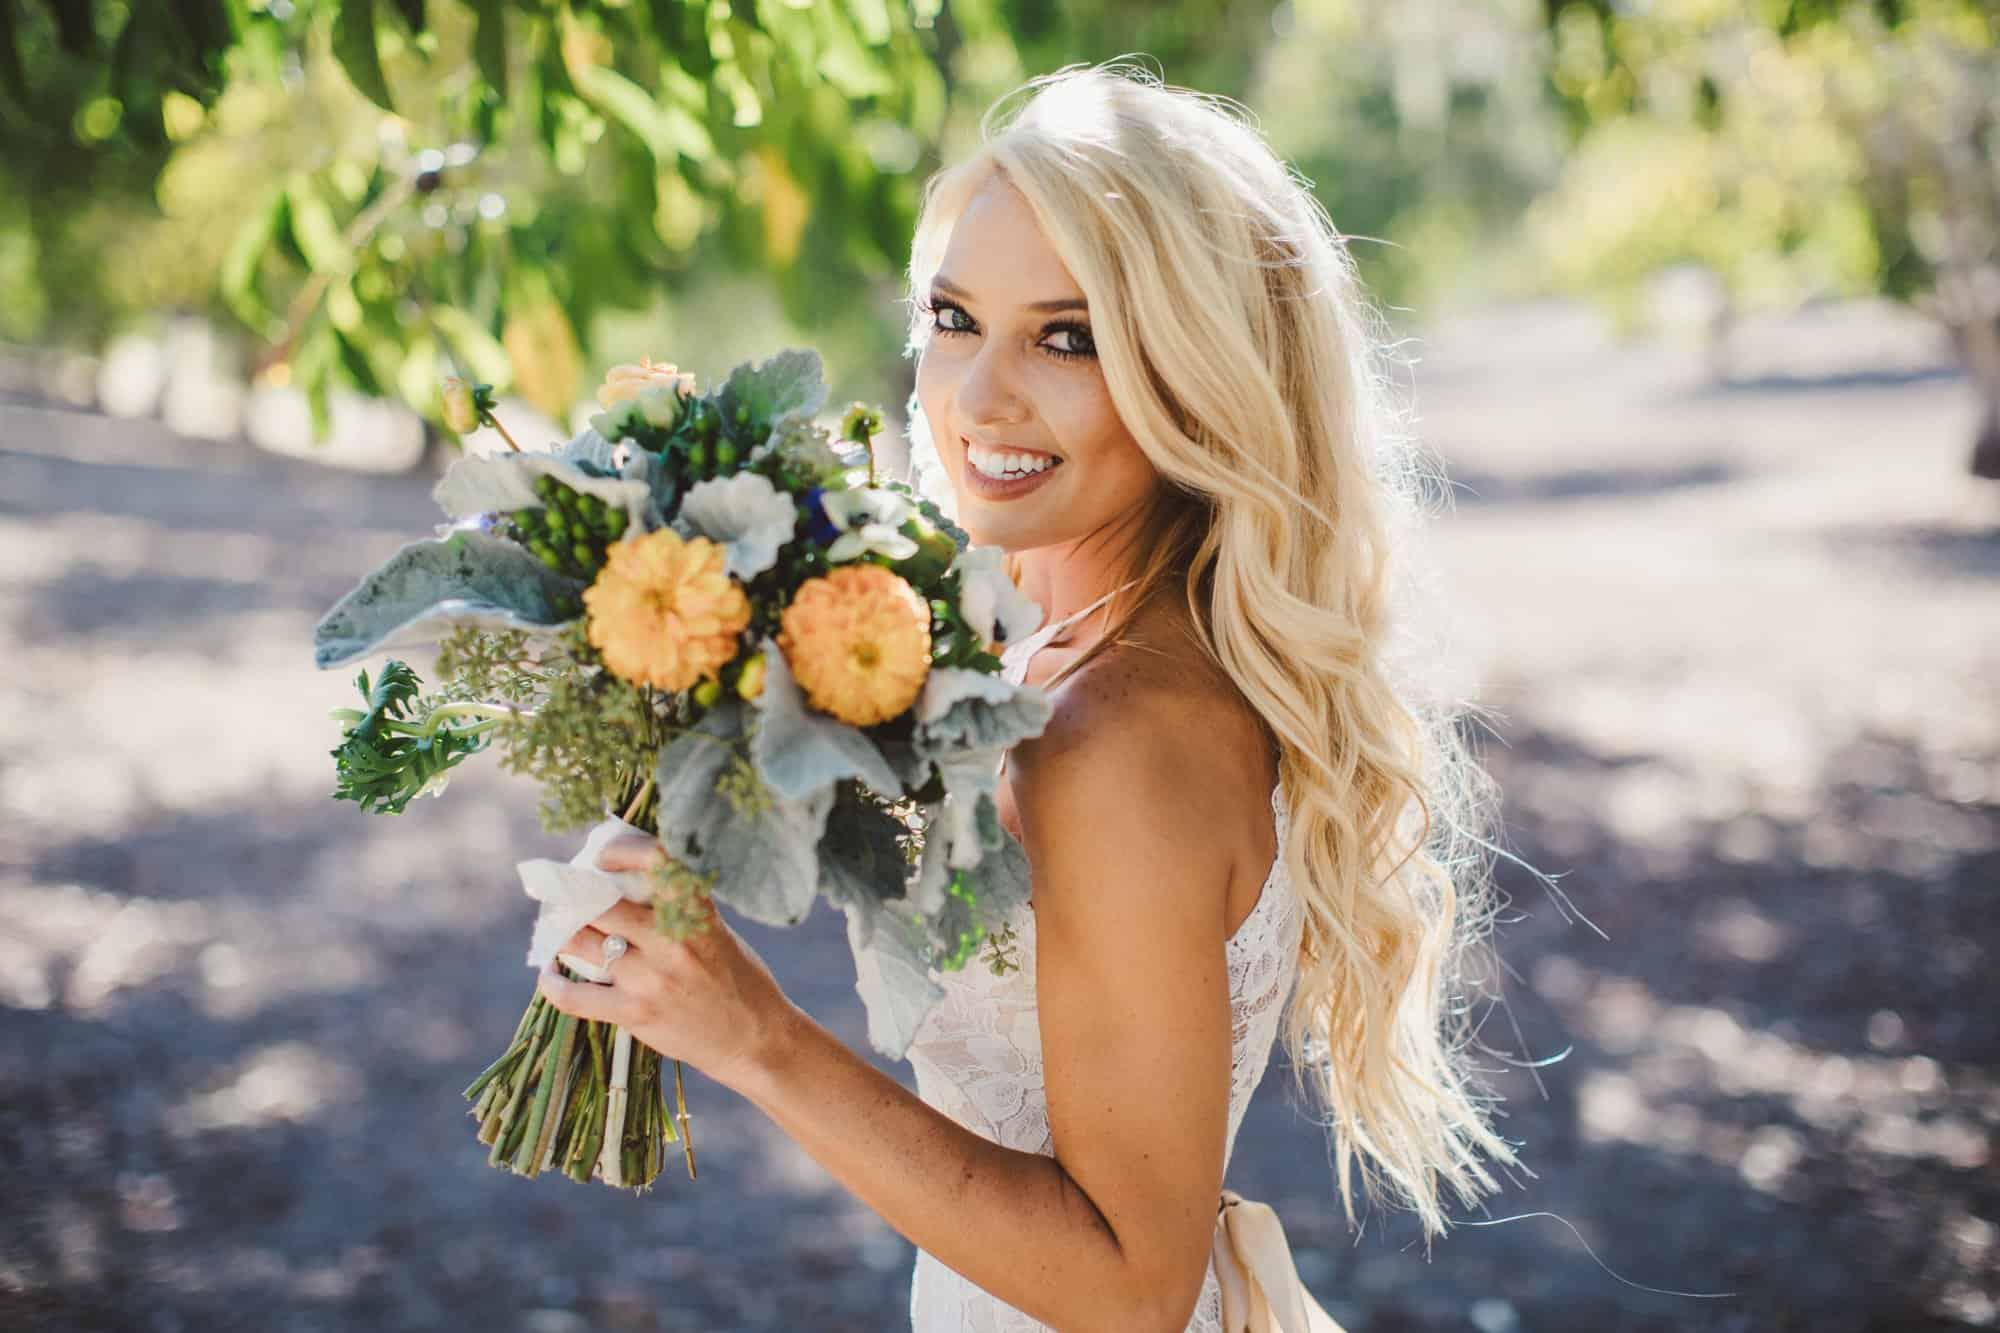 opolo vineyards bride floral arrangement wedding